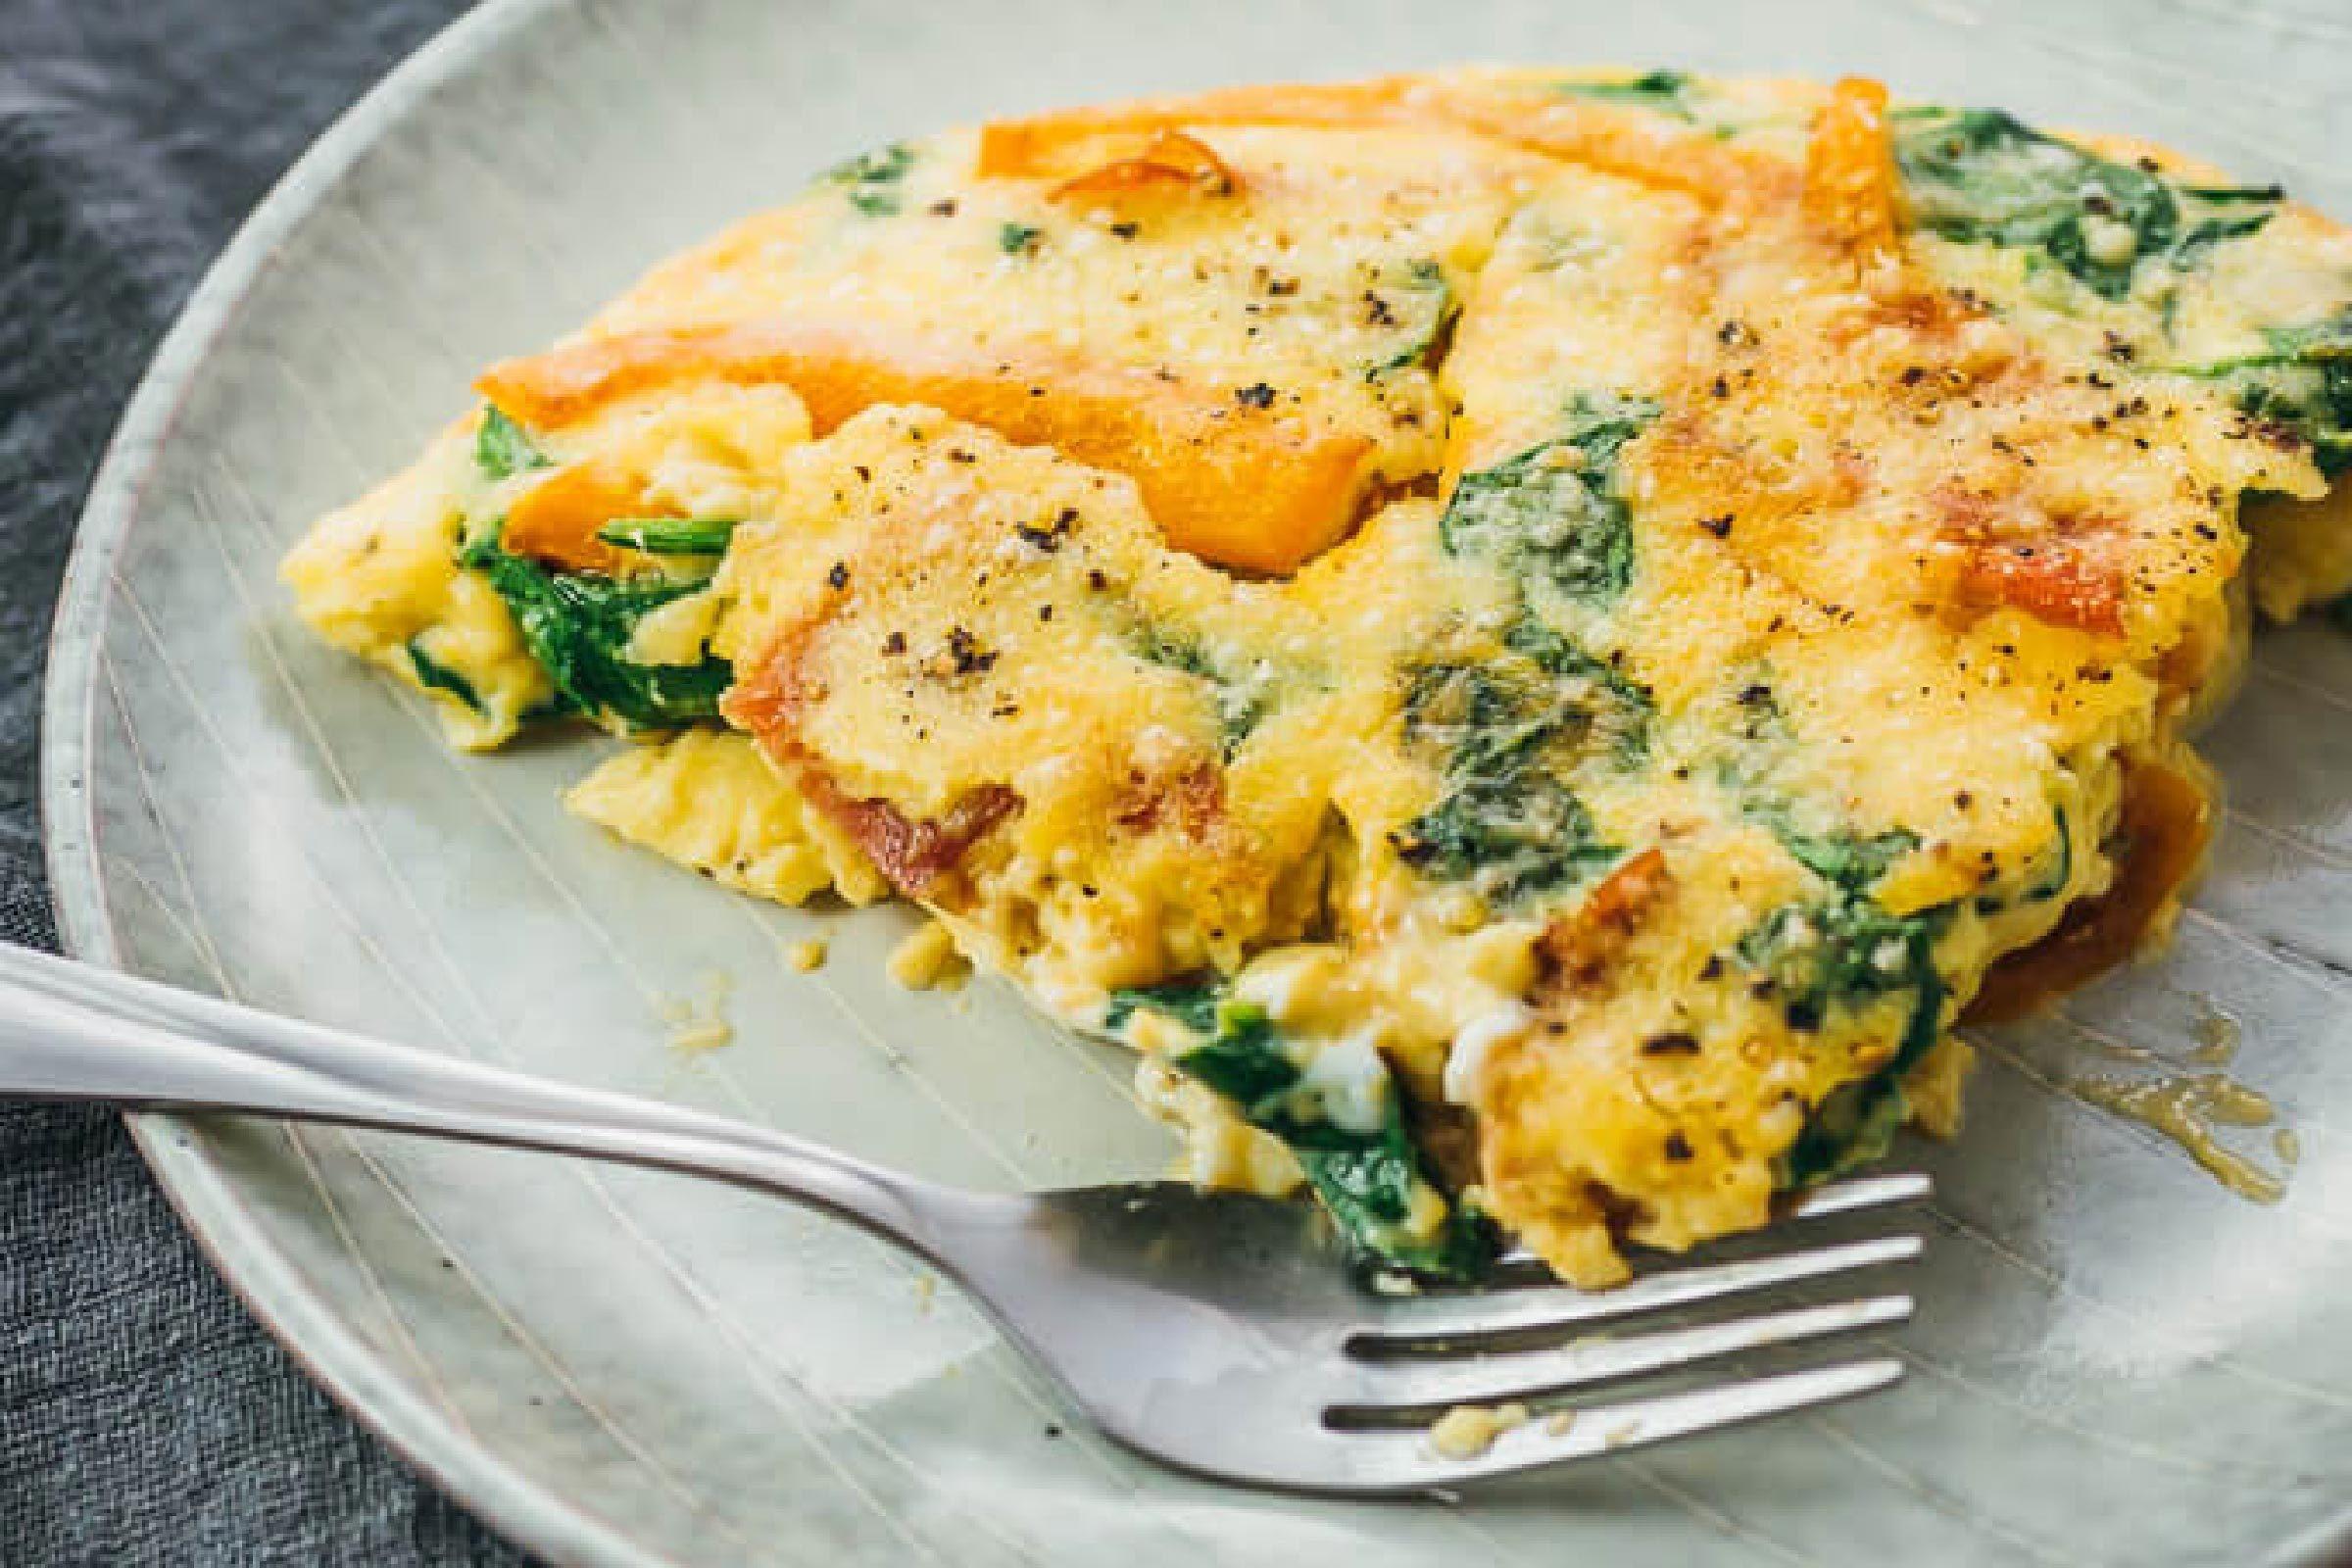 Keto Breakfast Recipes For Beginners  Keto Diet Menu The Best e for Beginners